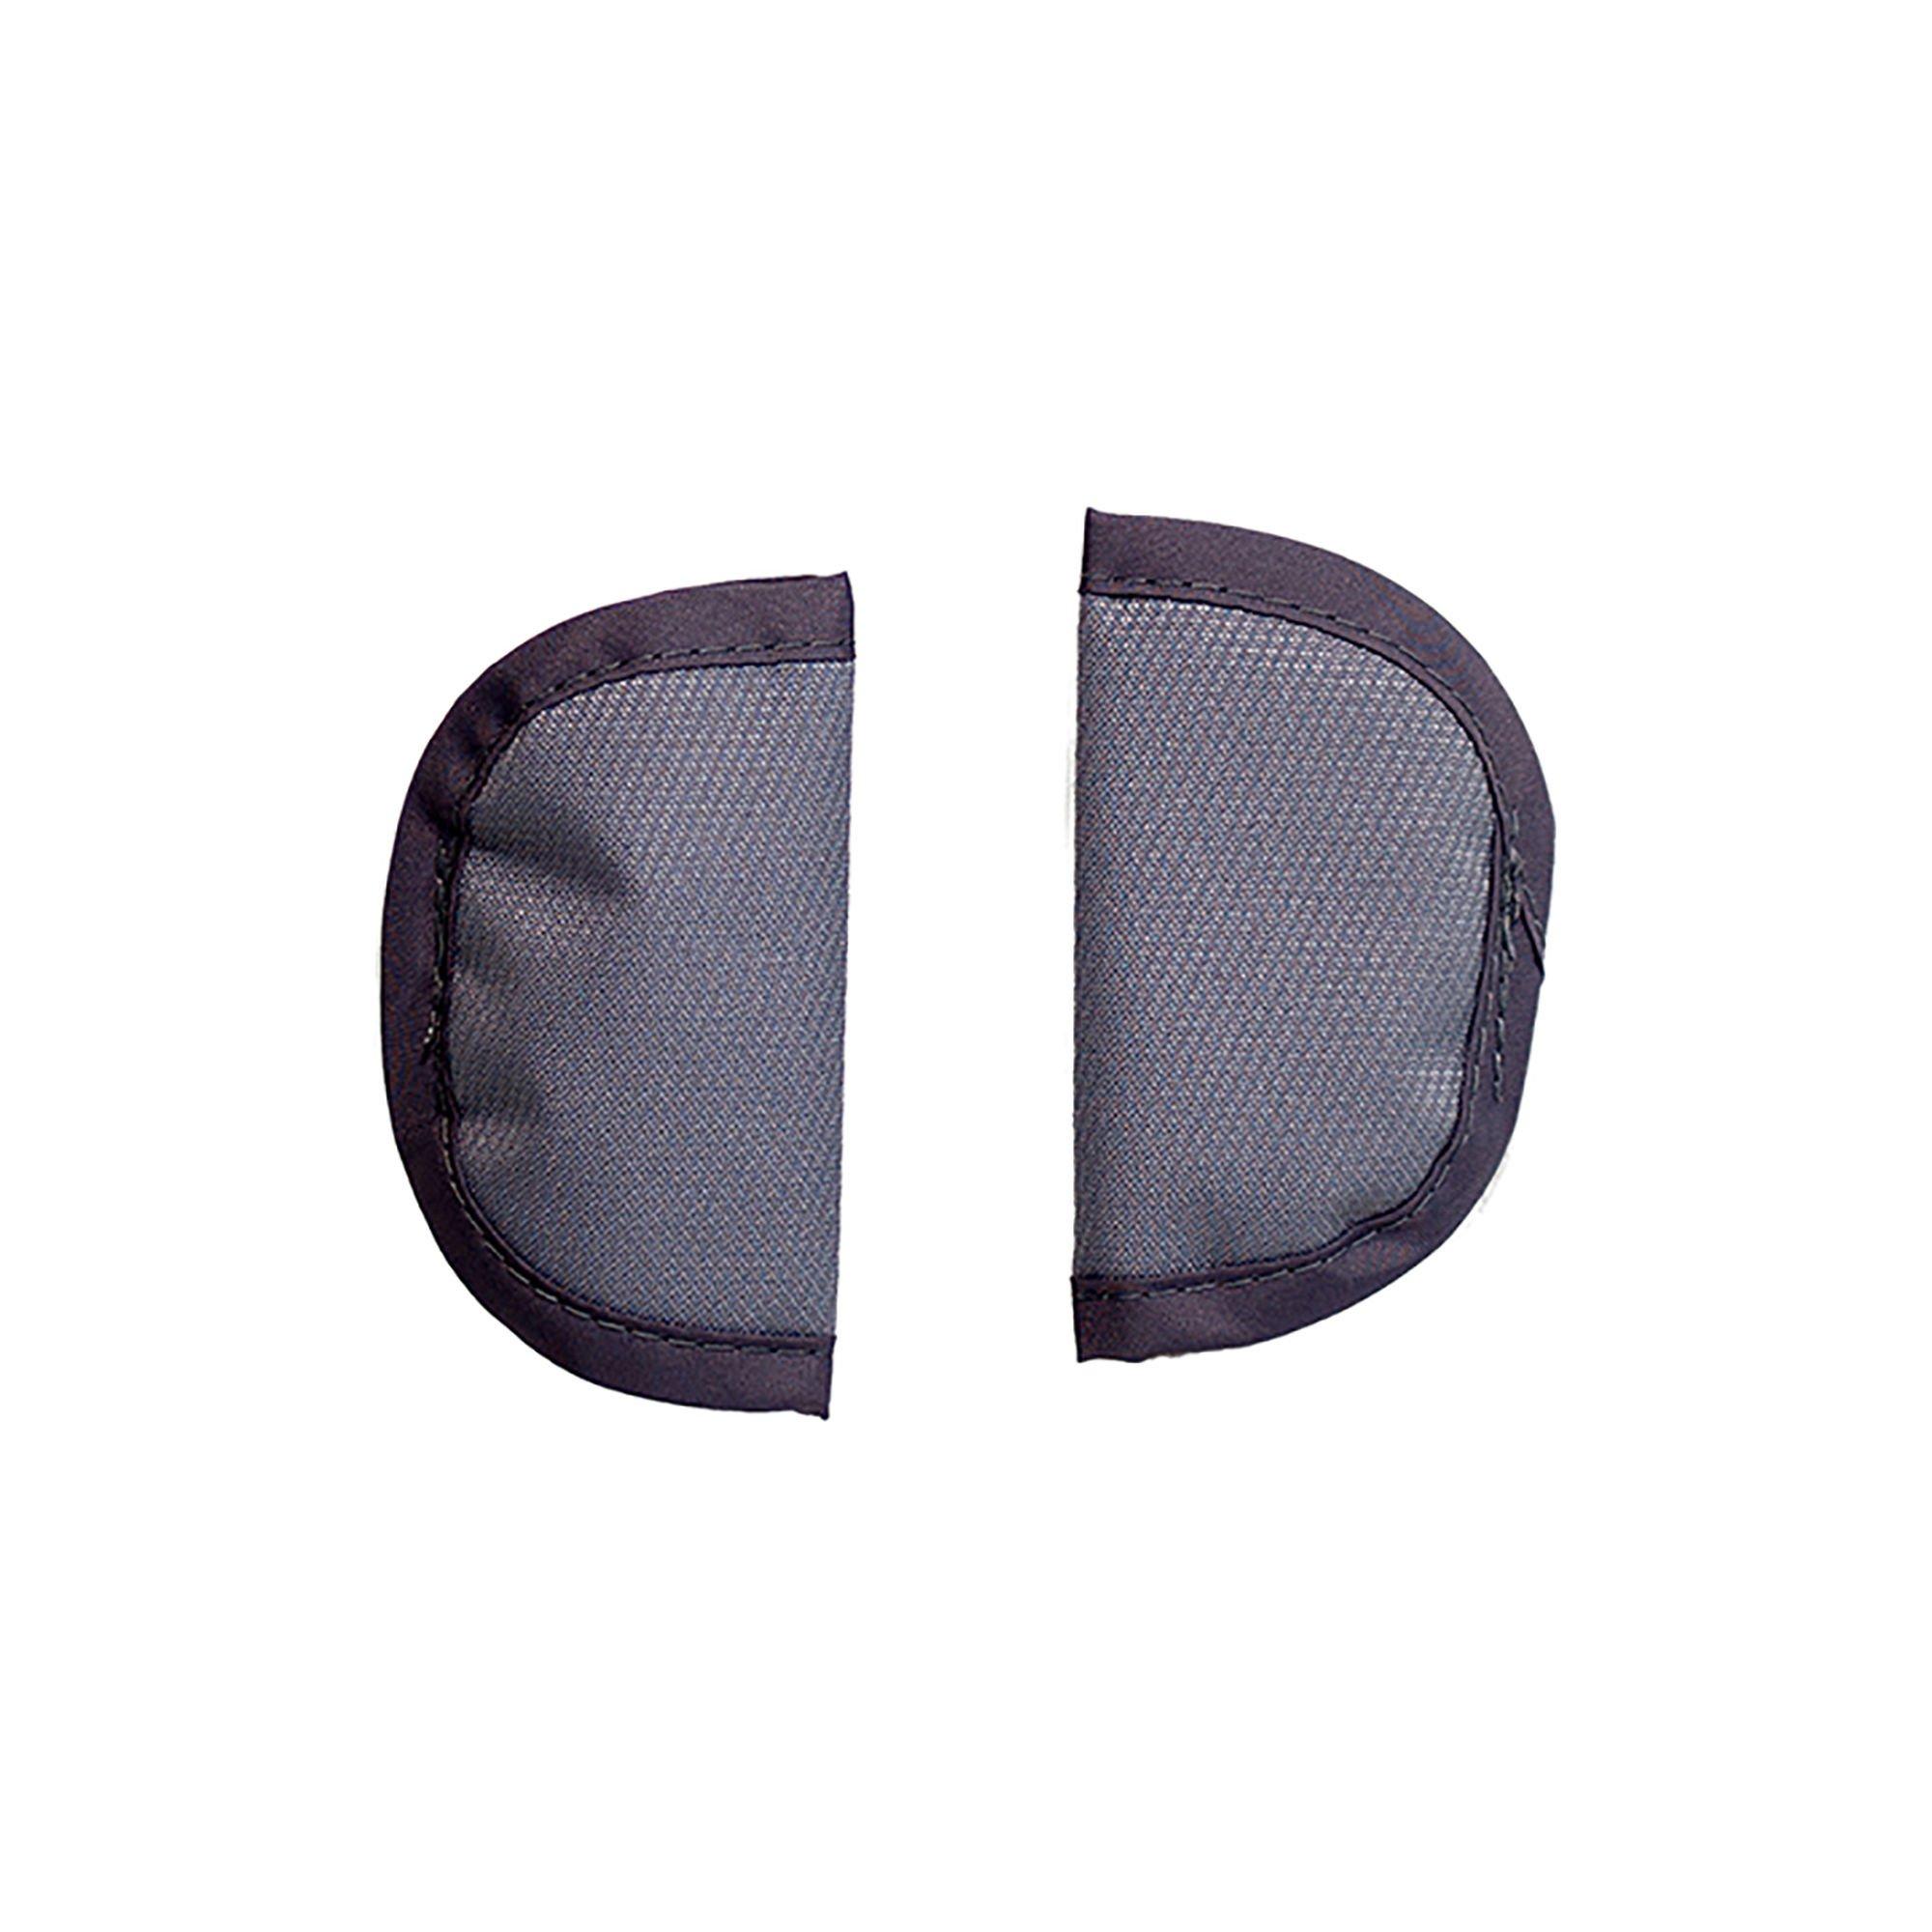 Chicco KeyFit 30 Infant Car Seat Shoulder Pads - Replacement Shoulder Pads - Coastal